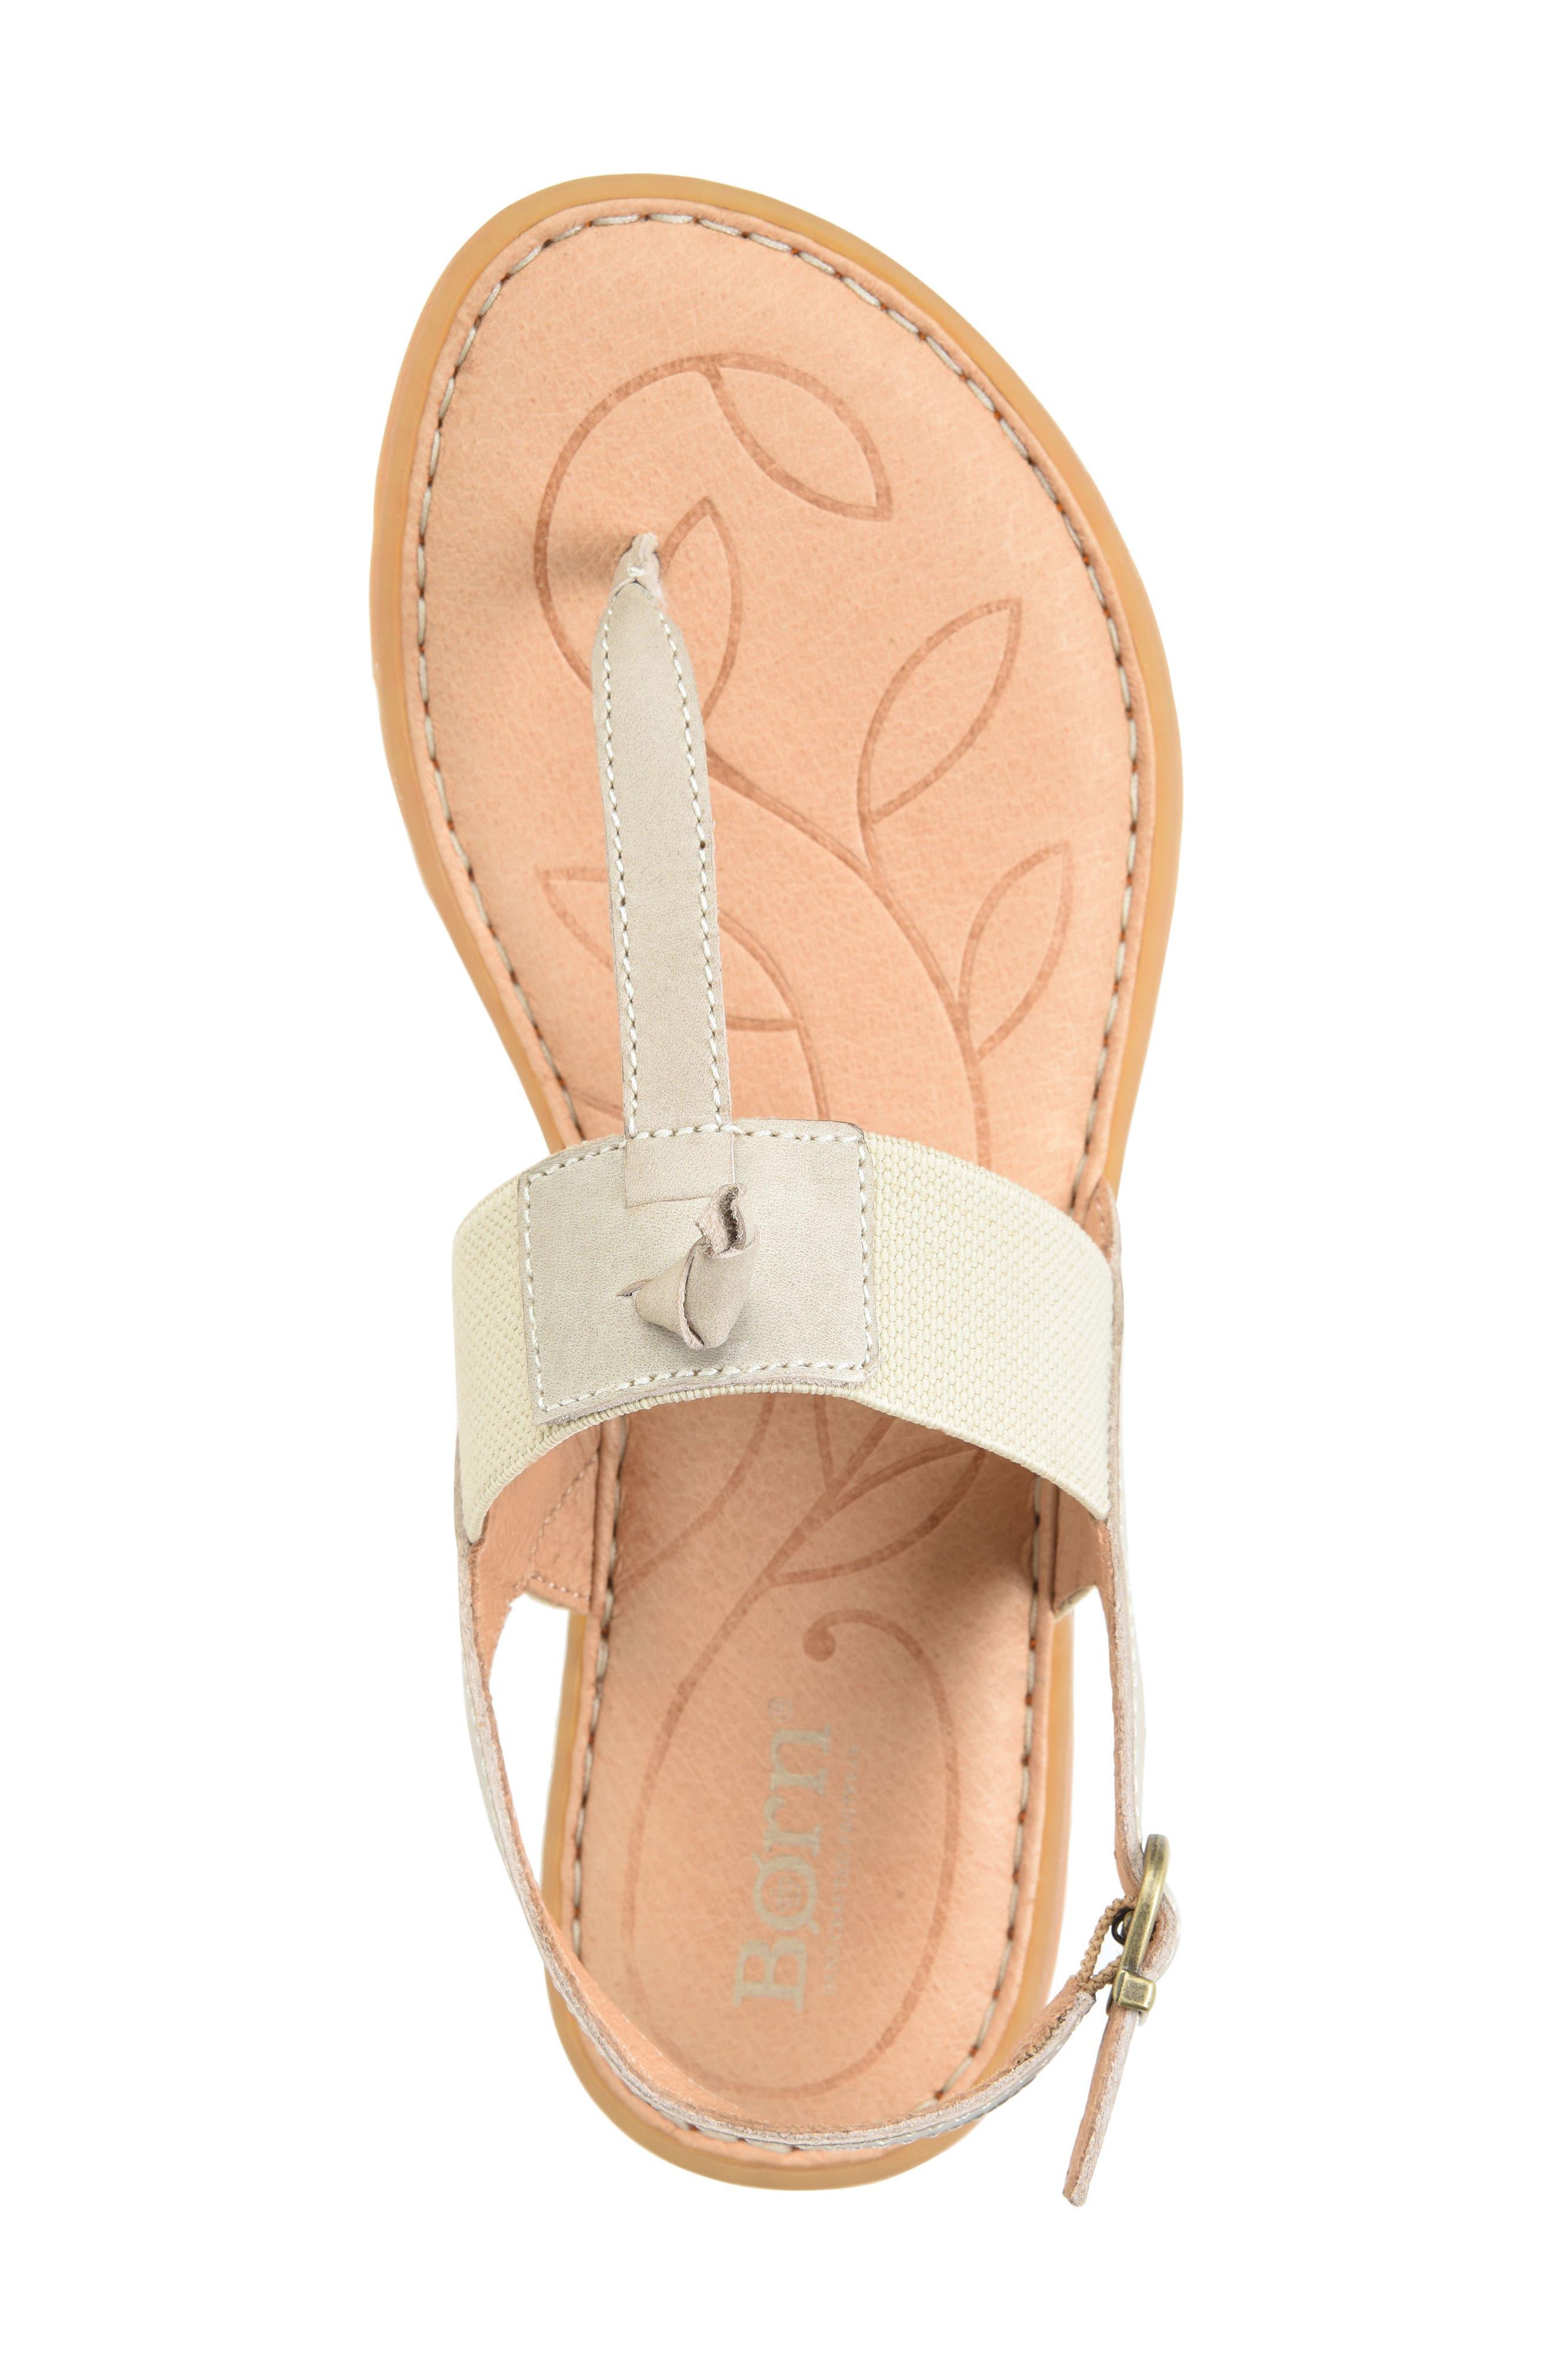 Siri Sandal,                             Alternate thumbnail 3, color,                             Cream Leather